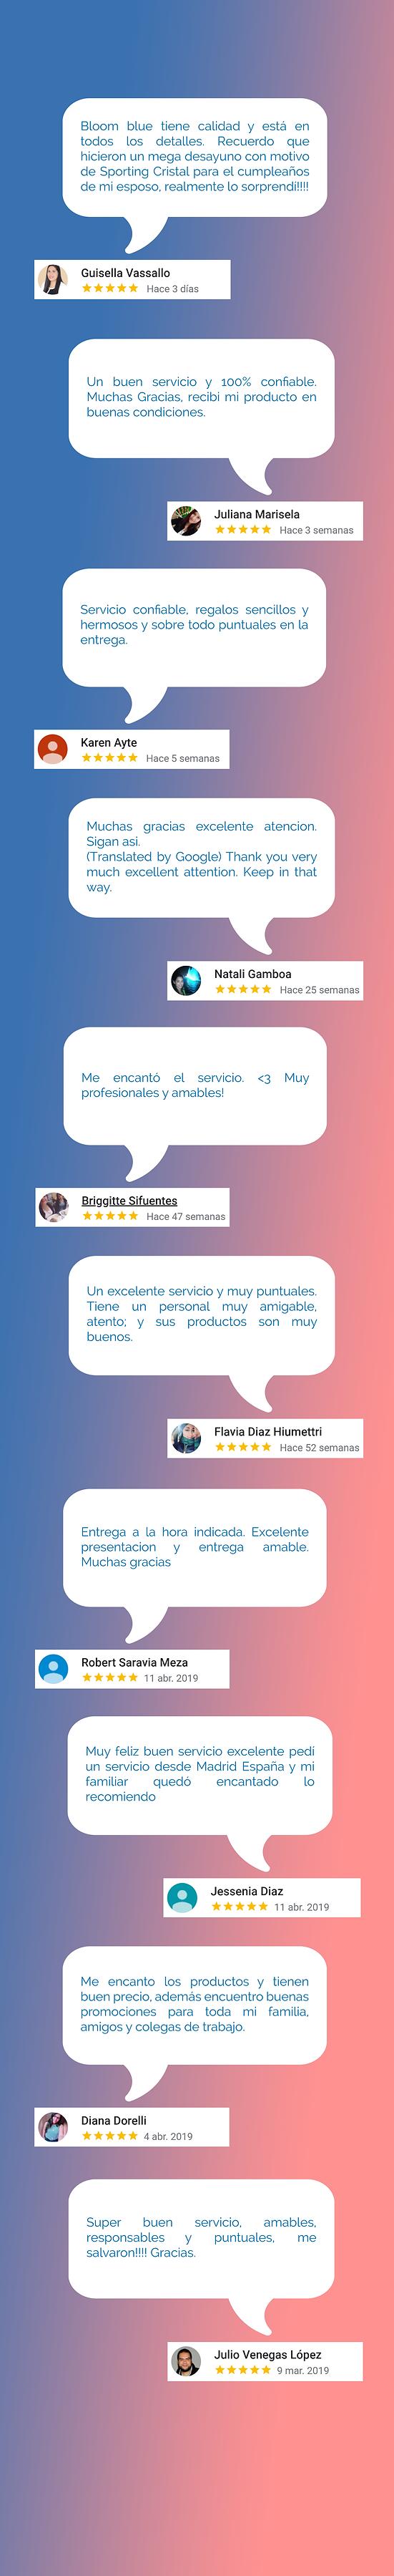 reseñas-de-clientes-bloom-blue.png